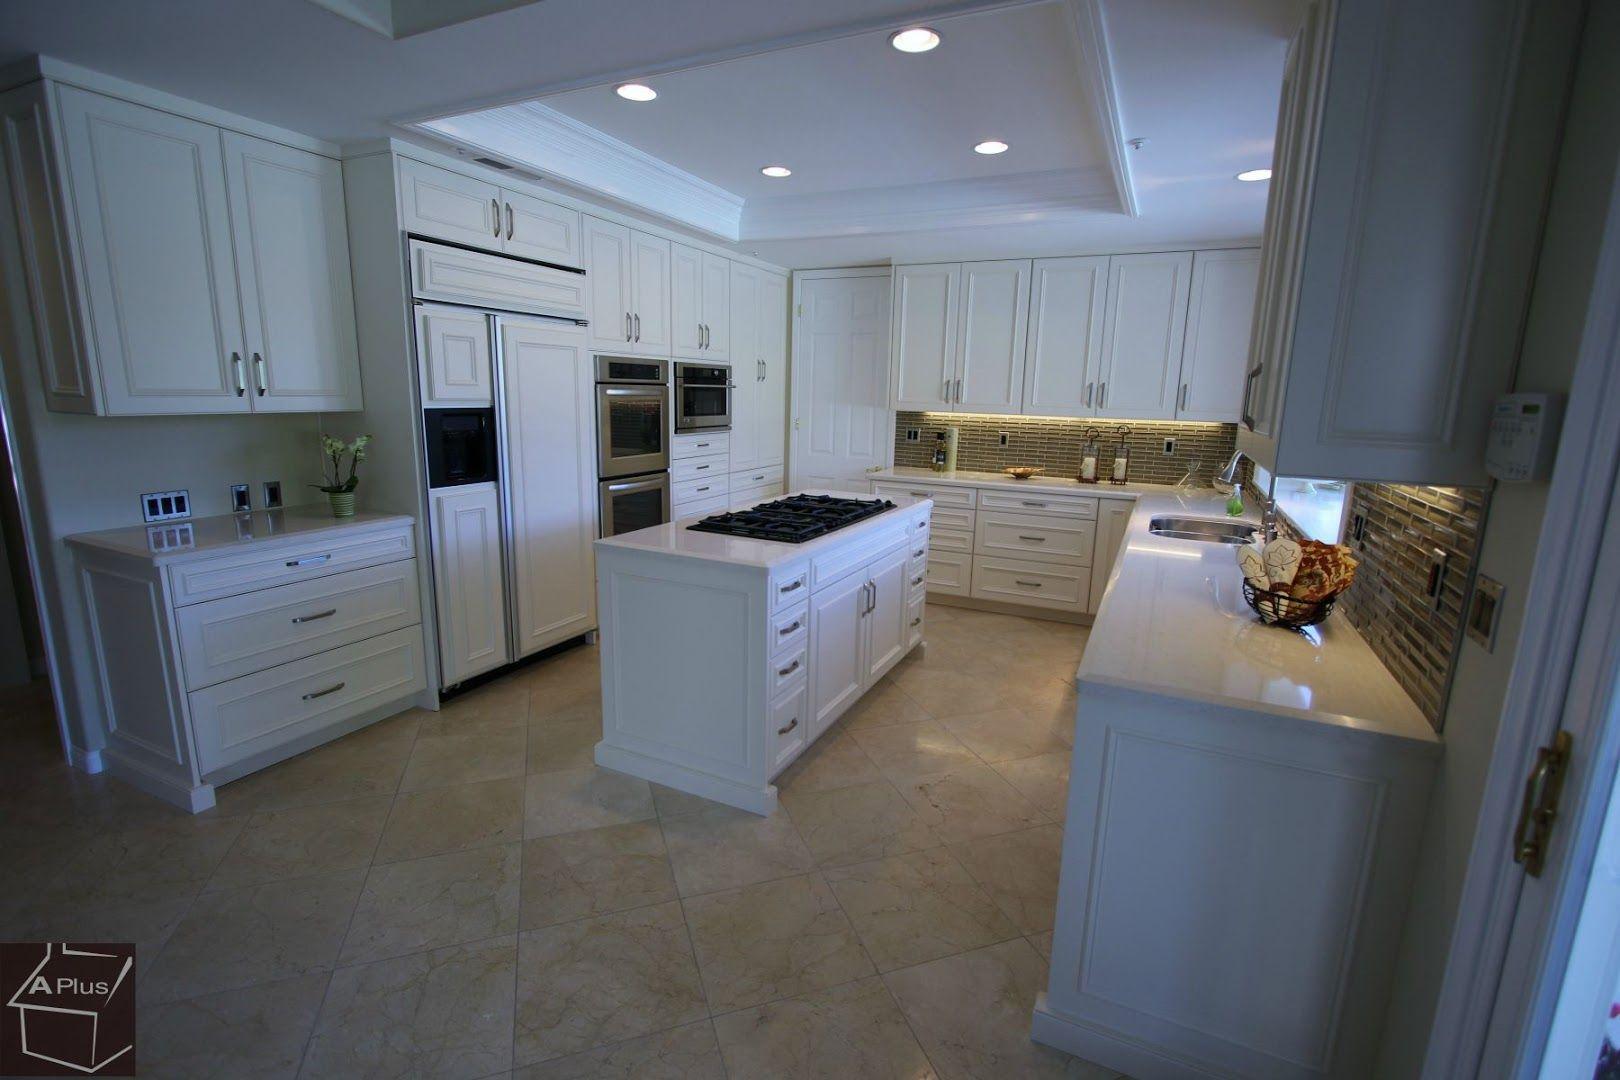 Classic style, Traditional Design Build #kitchenRemodel with custom White Aplus #Cabinets in Coto De caza, #OrangeCounty